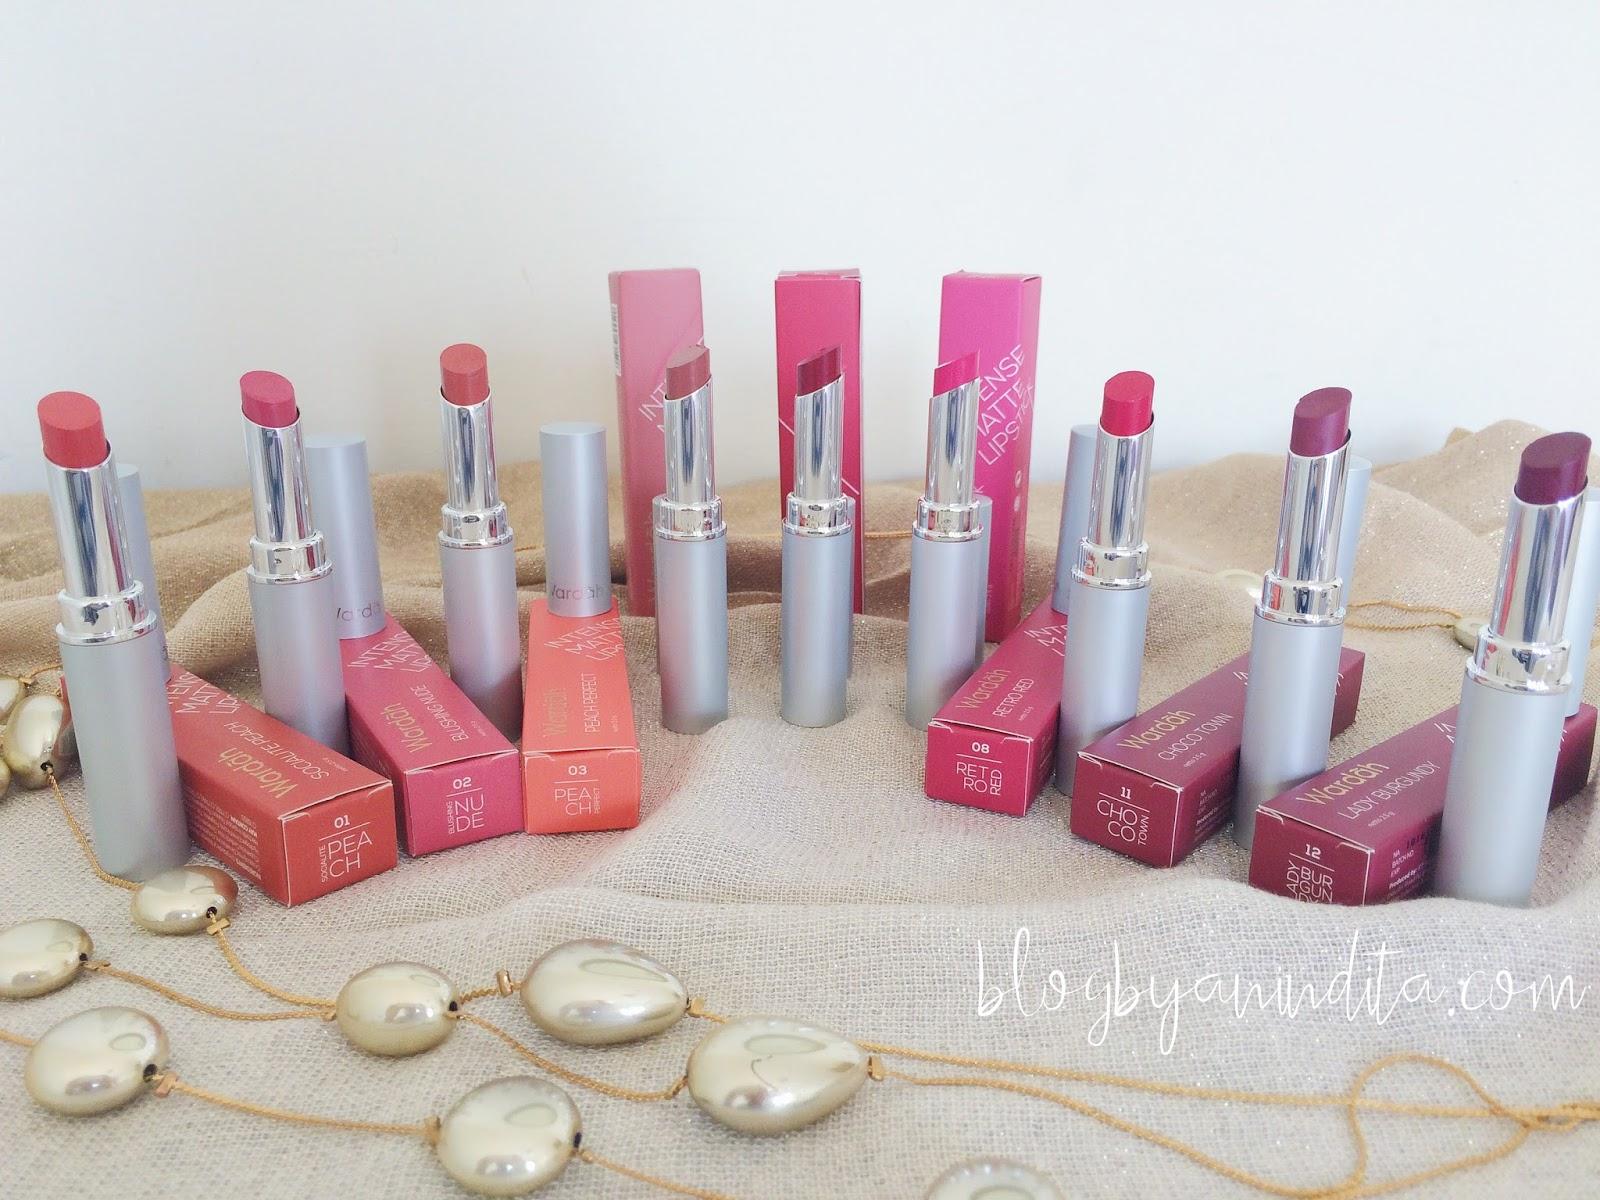 Wardah Intense Matte Lipstick 06 Blooming Pink8 Daftar Harga Passionate Pink 07 25gr Shopee Indonesia Source Lippen Ini Lagi Hitzz Di Kalangan Beauty Blogger Vlogger U Name It Lah Pokoknya